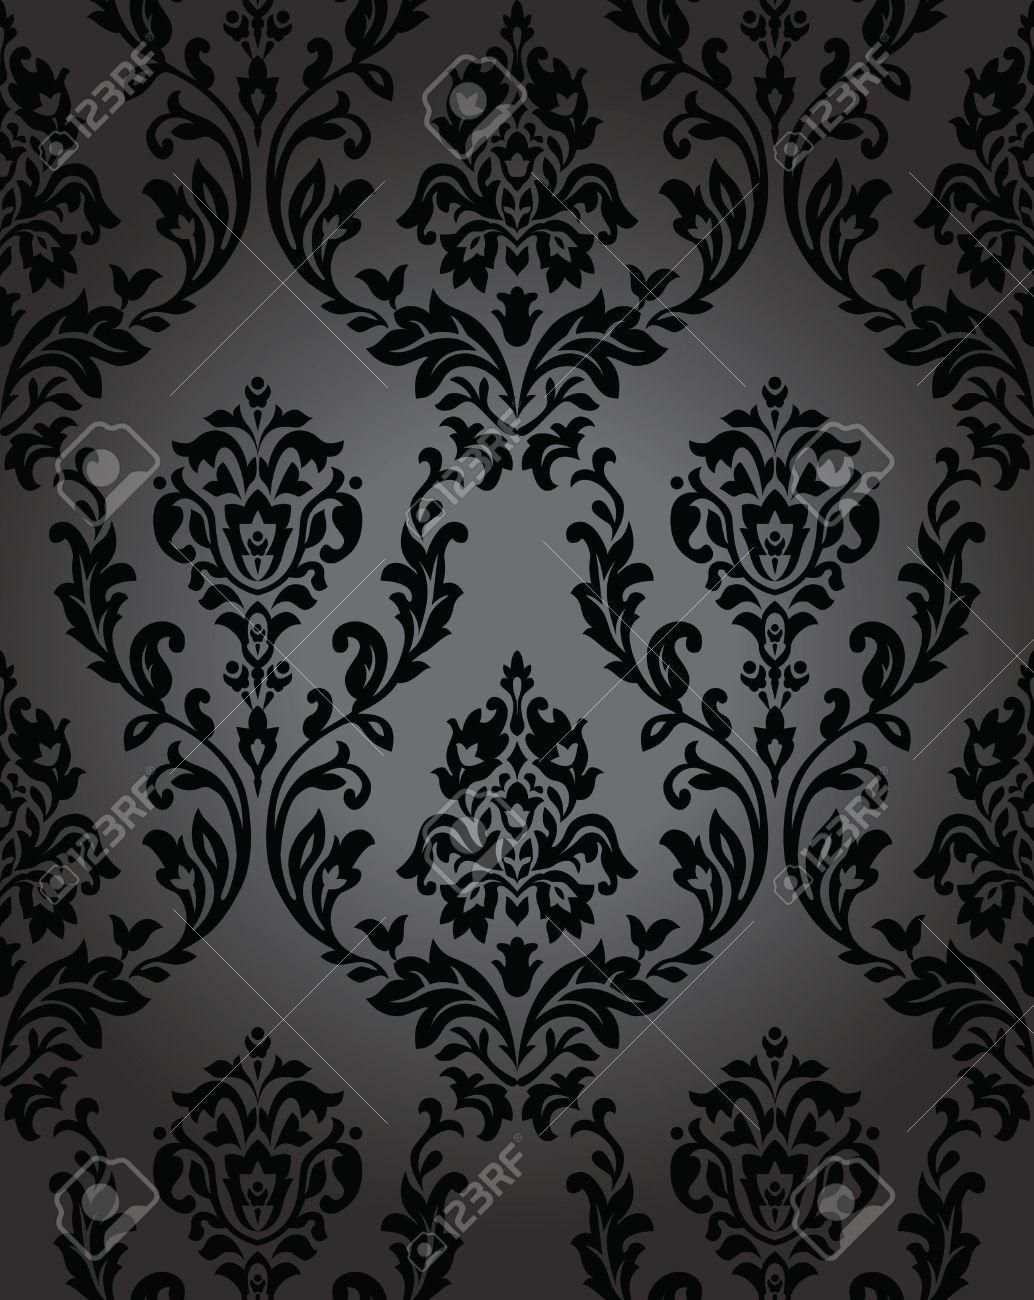 Seamless Wallpaper Baroque Black Royalty Free Cliparts, Vectors